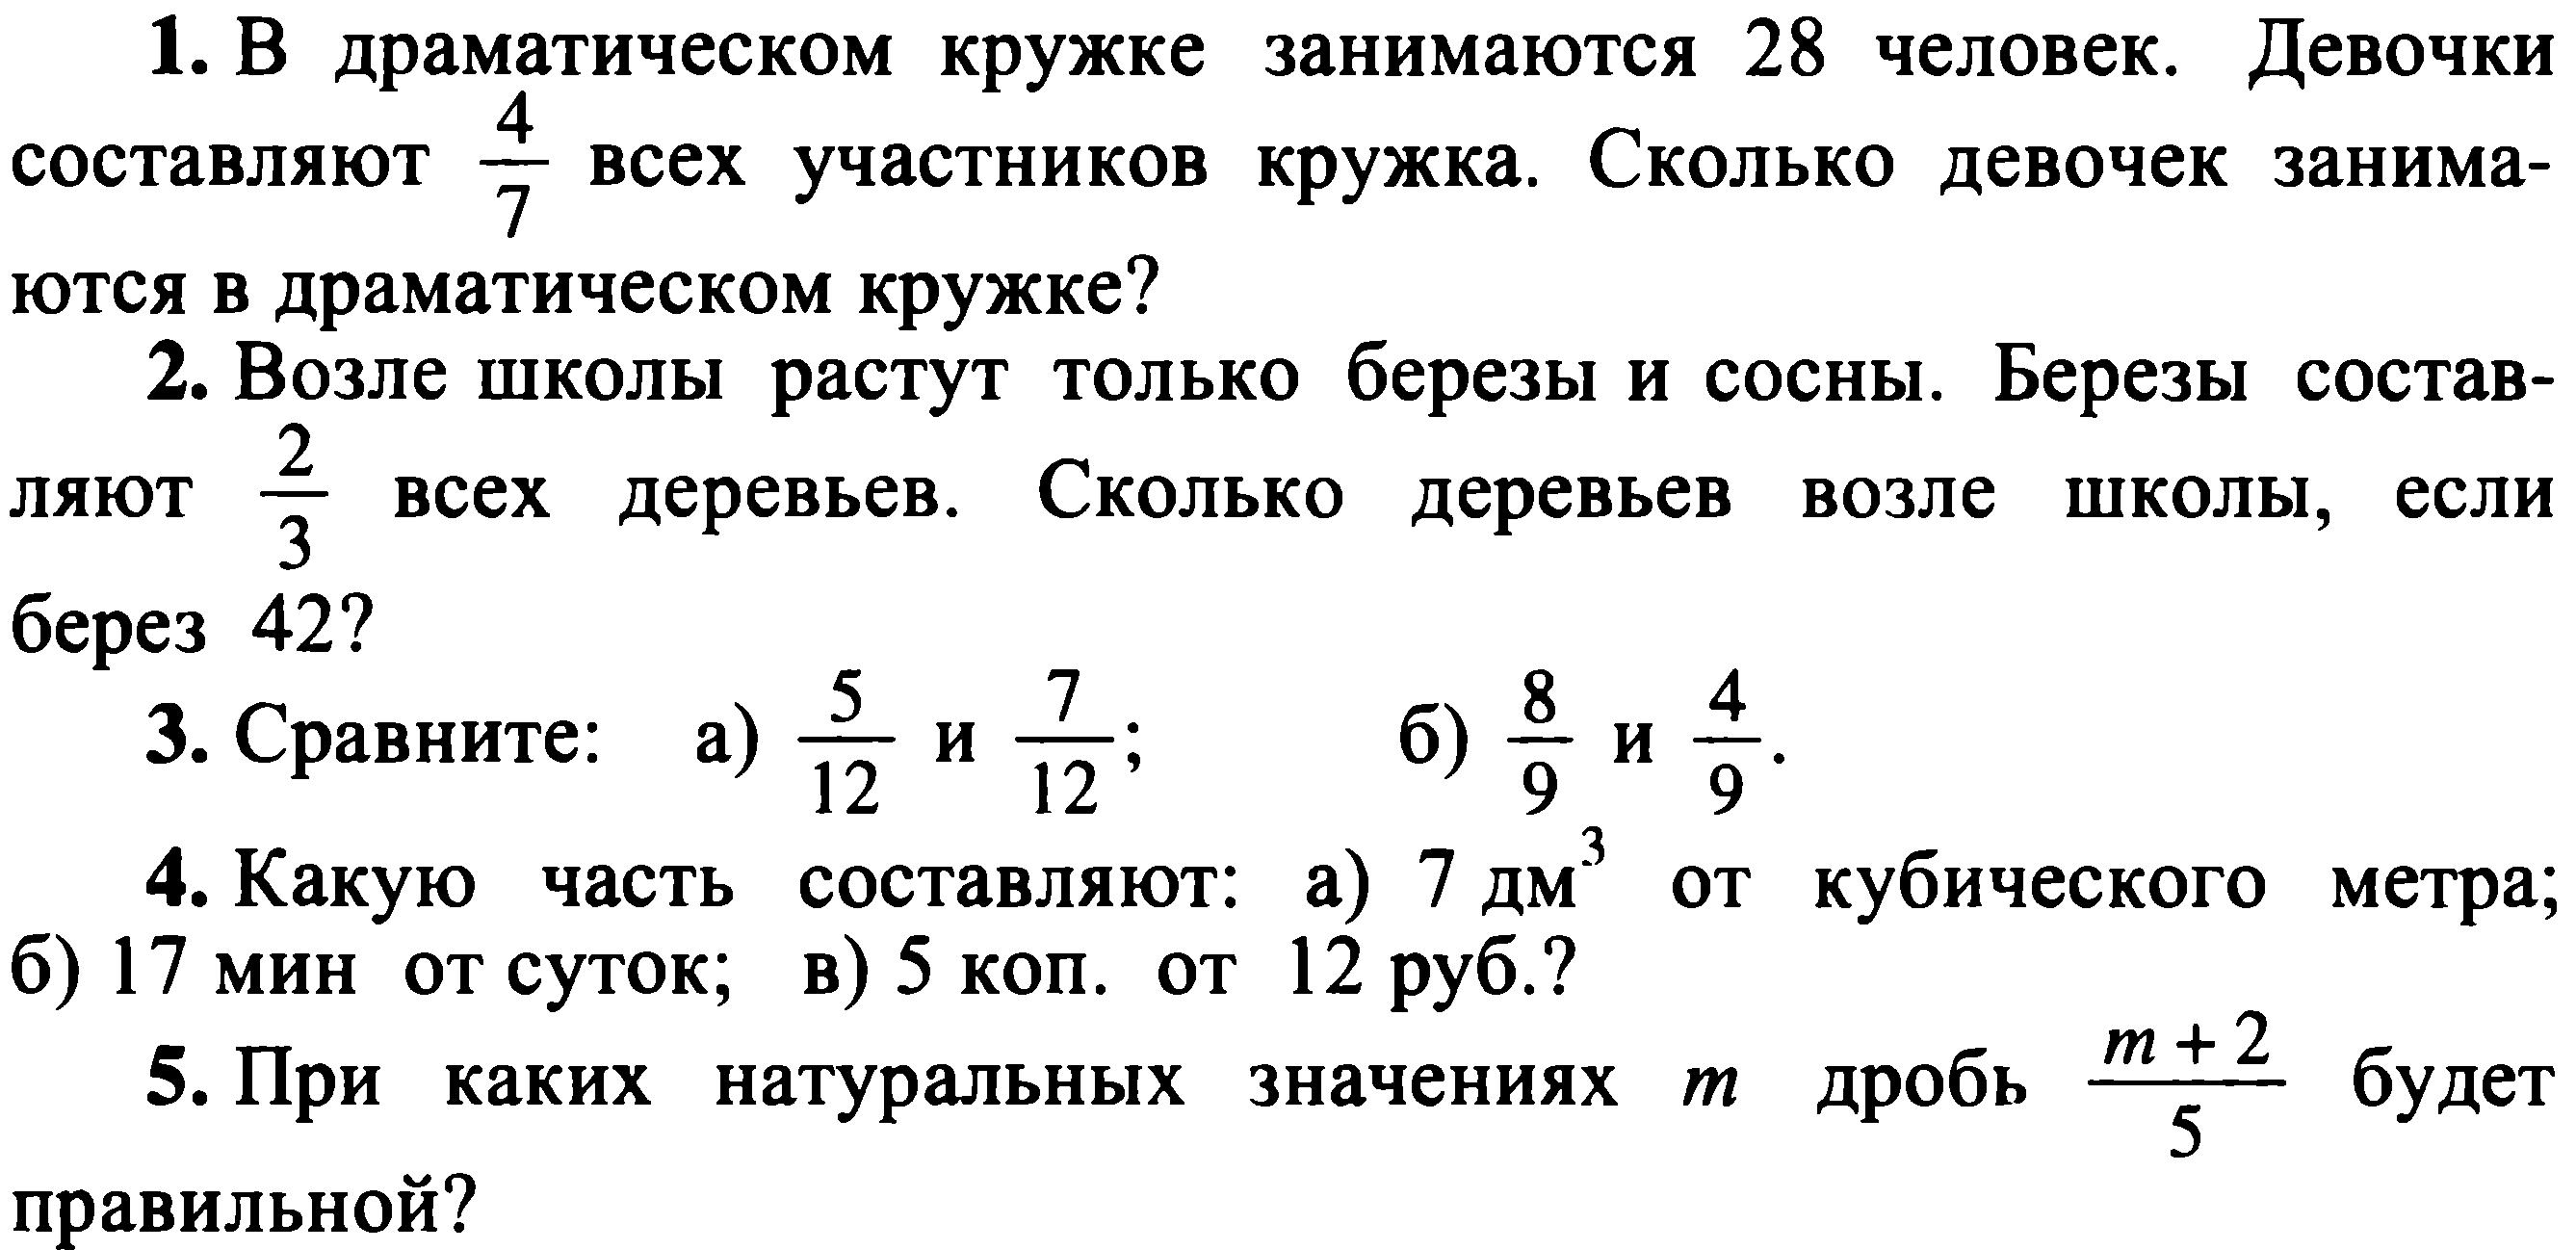 п 38 гдз 6 виленкин класс к-11